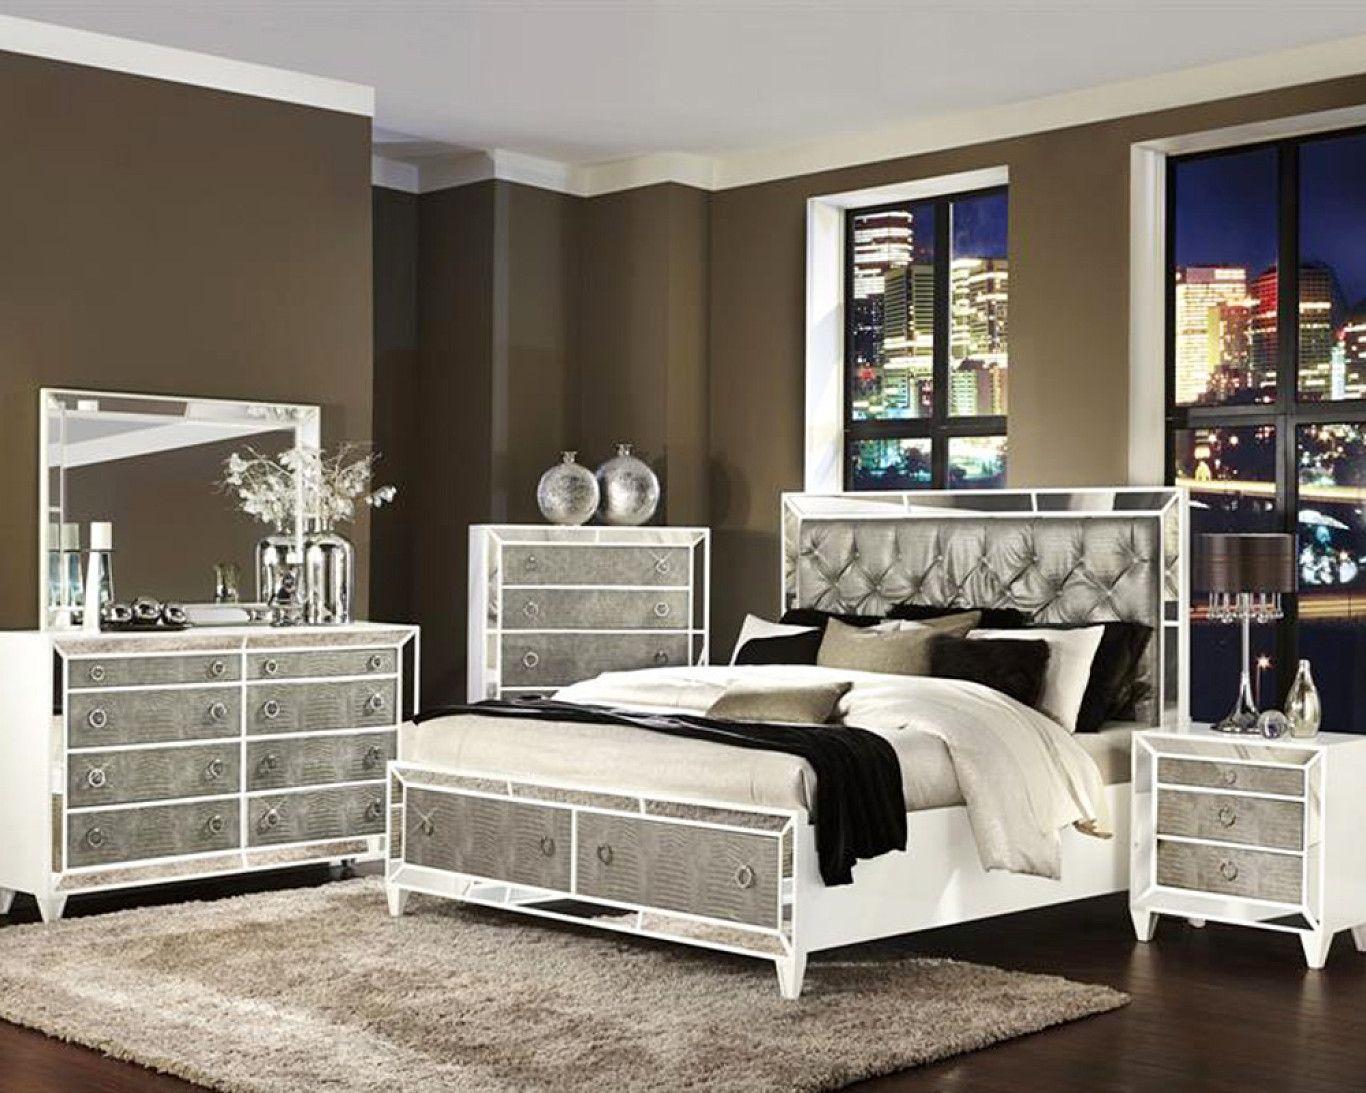 7 Pc Bedroom Set For 199 Las Vegas Full Size Bedroom Furniture